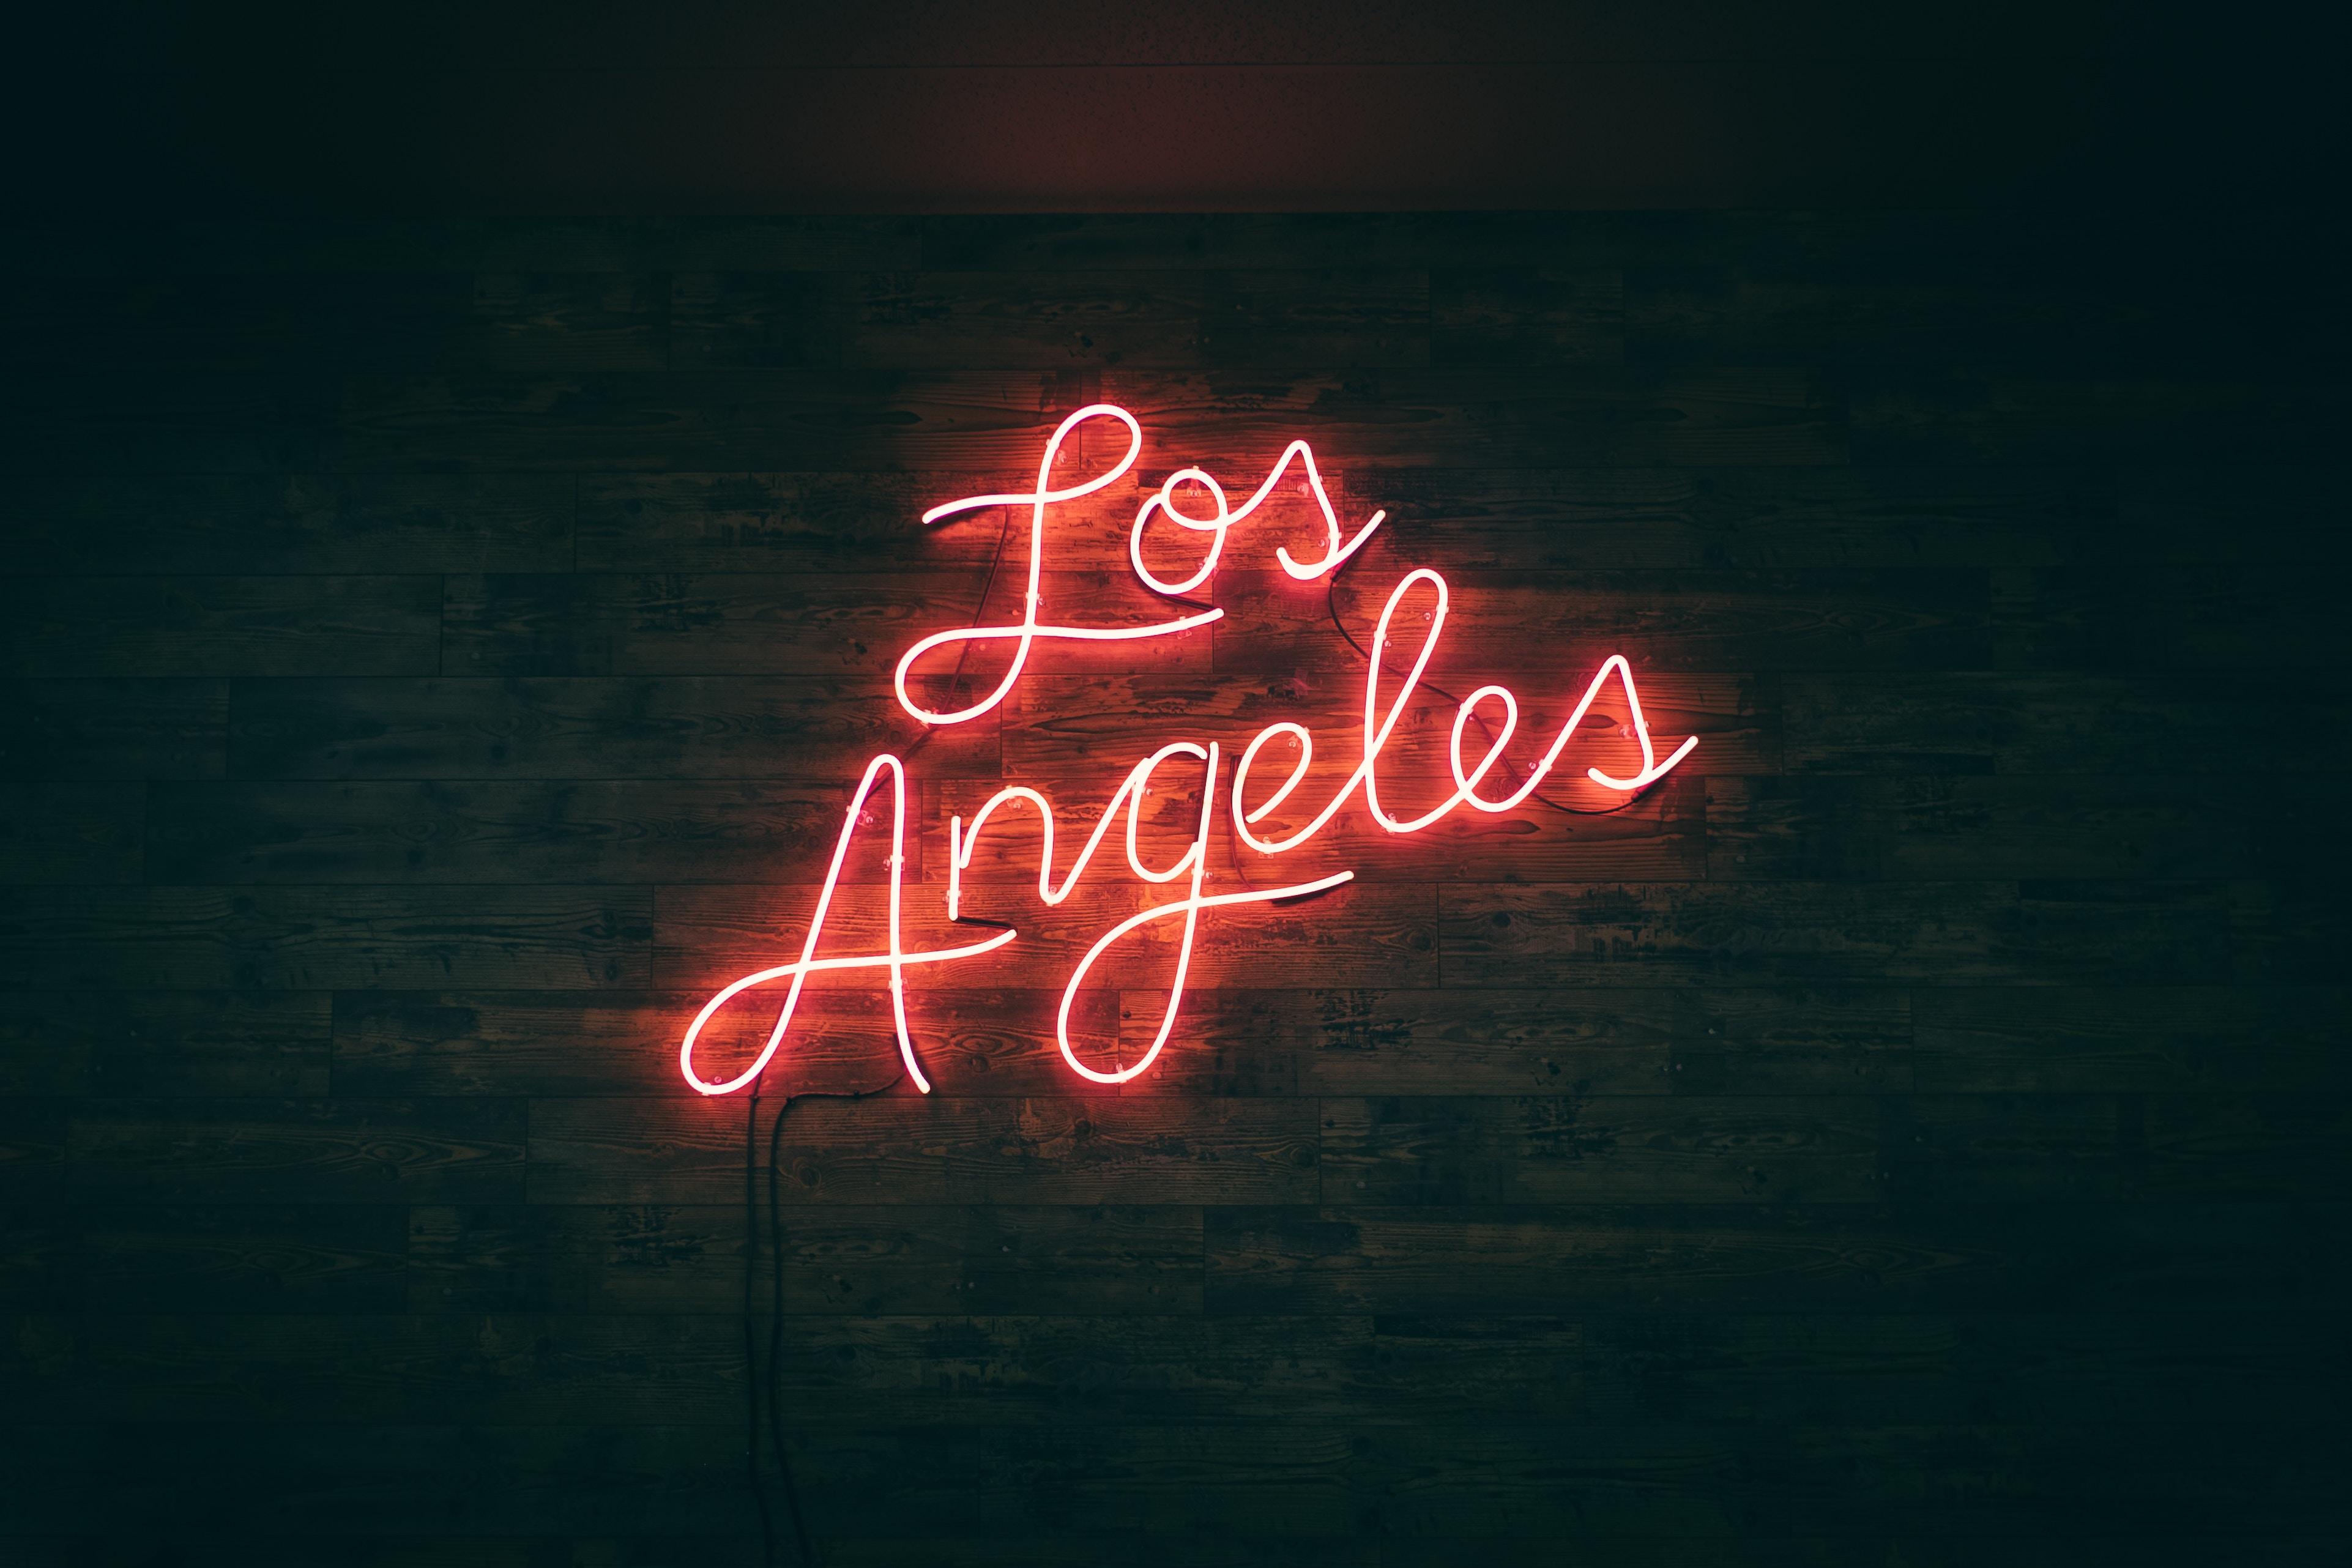 Los Angeles sign.